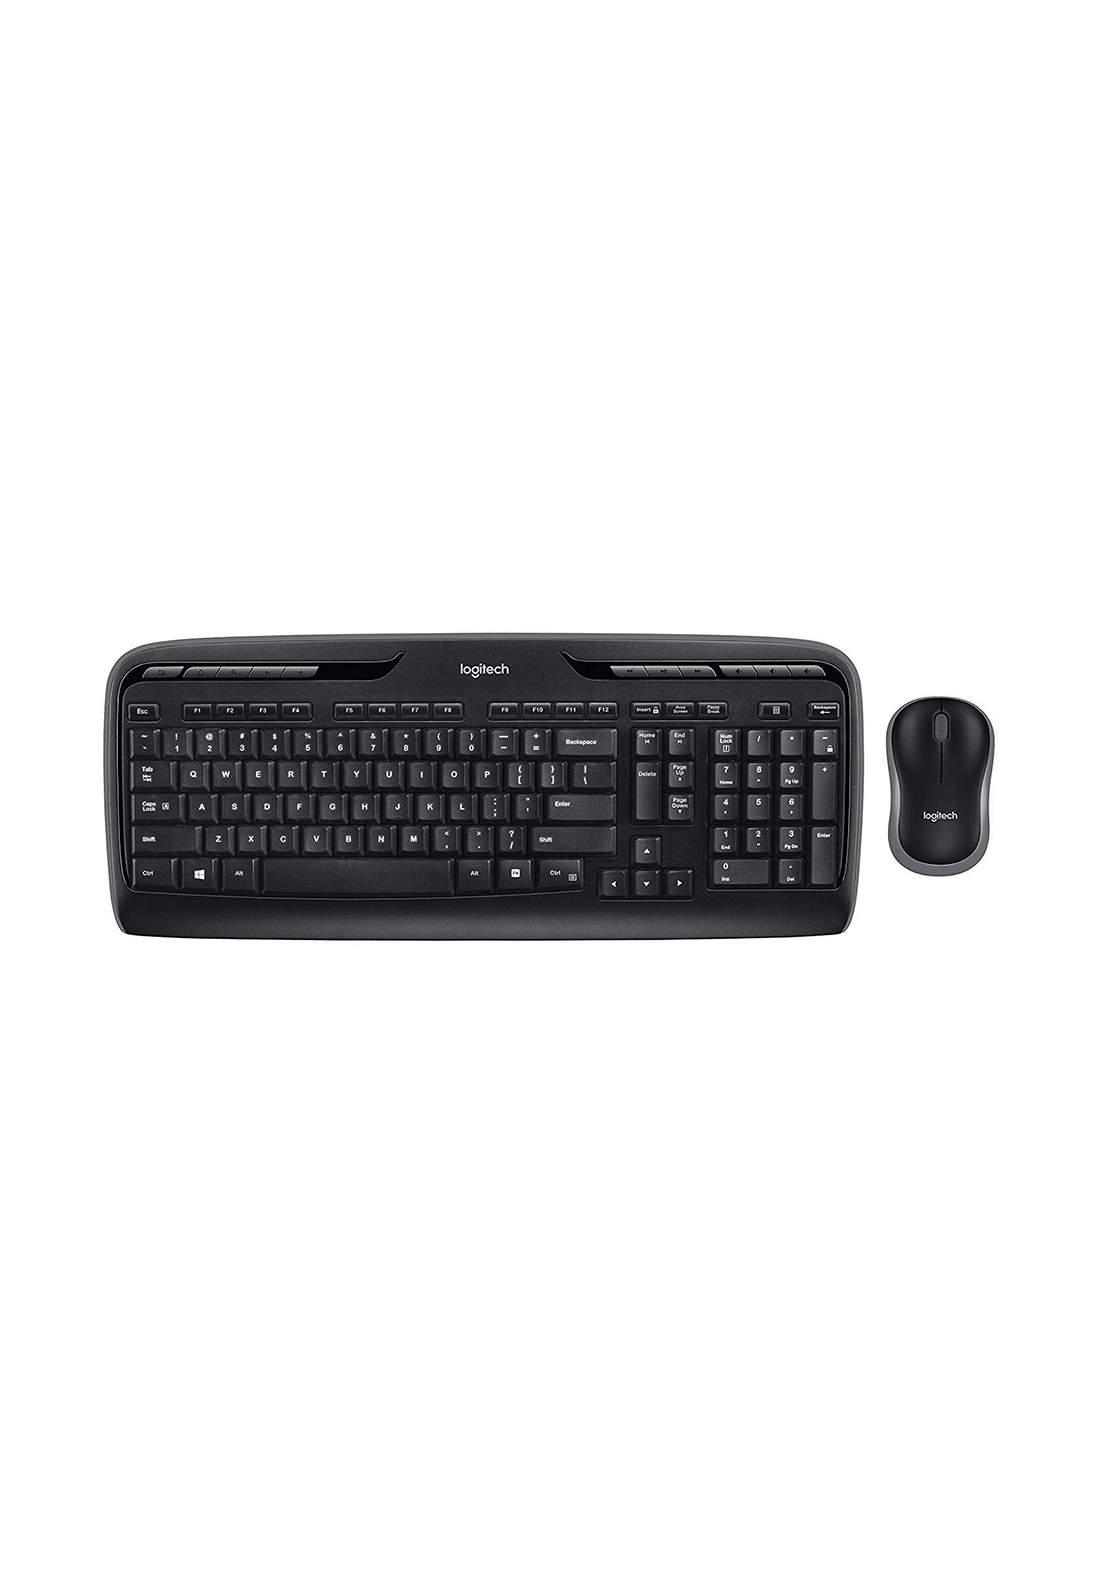 Logitech Wireless Combo MK330 Keyboard and mouse set -Black  لوحة مفاتيح وماوس